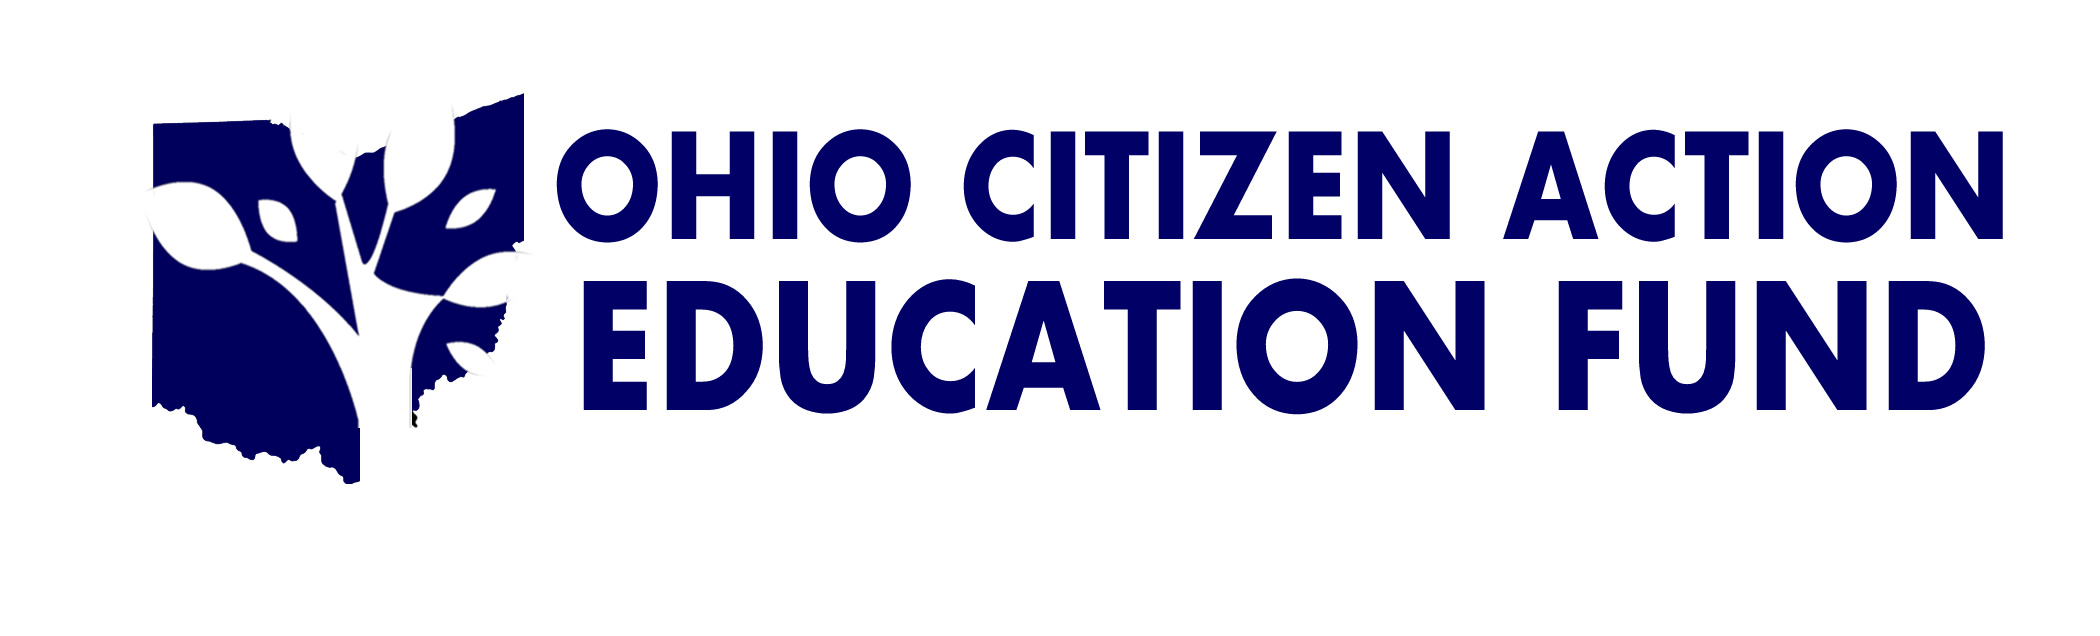 Ohio Citizen Action Education Fund logo